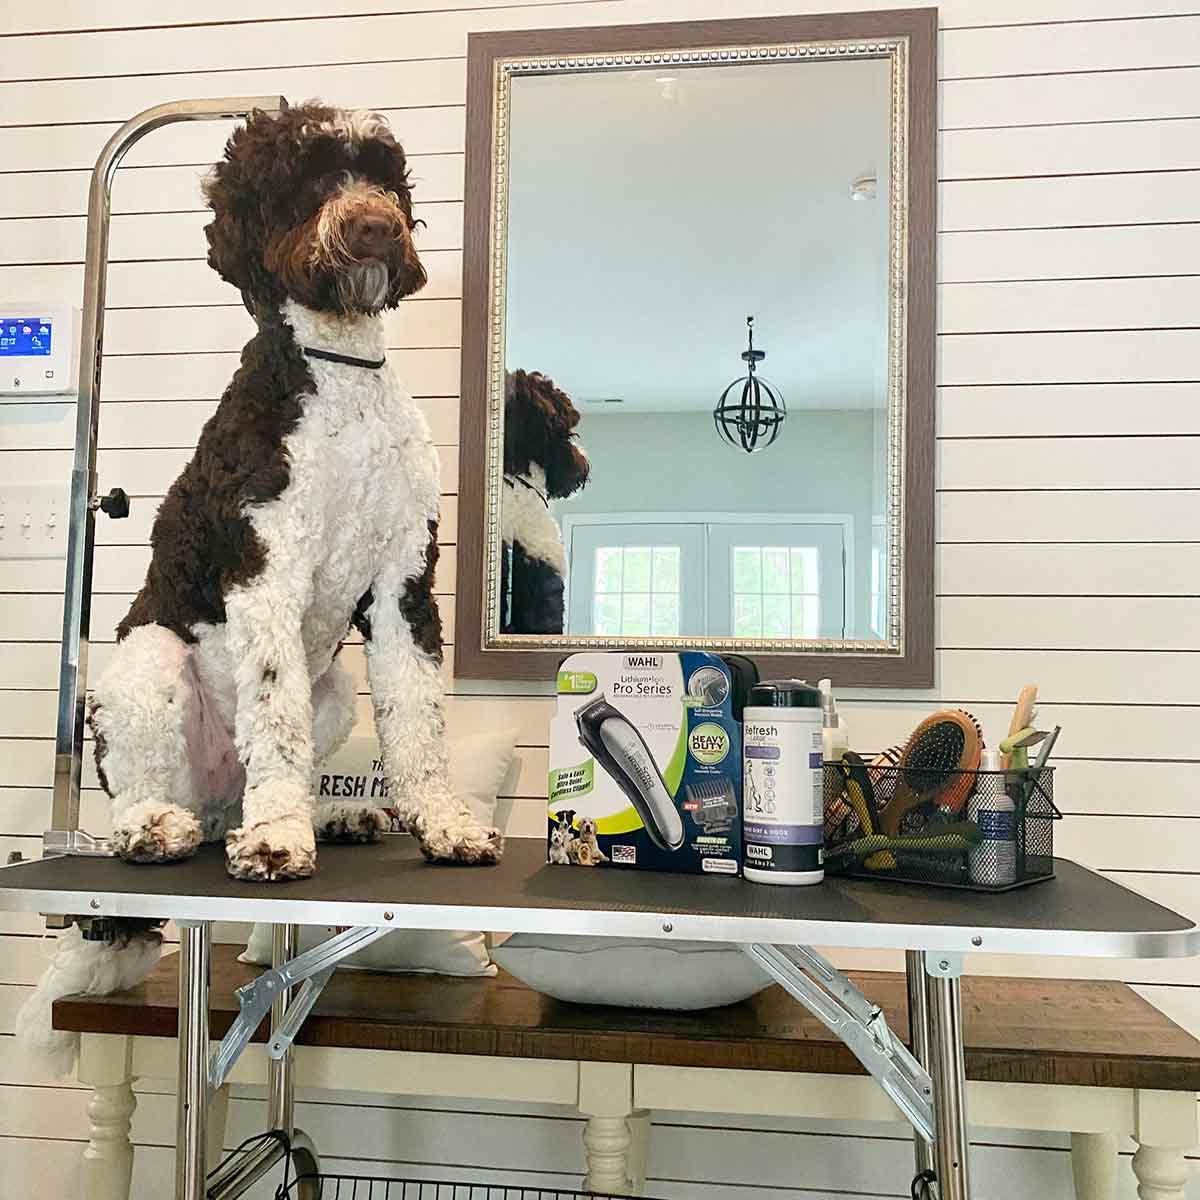 Luca getting groomed